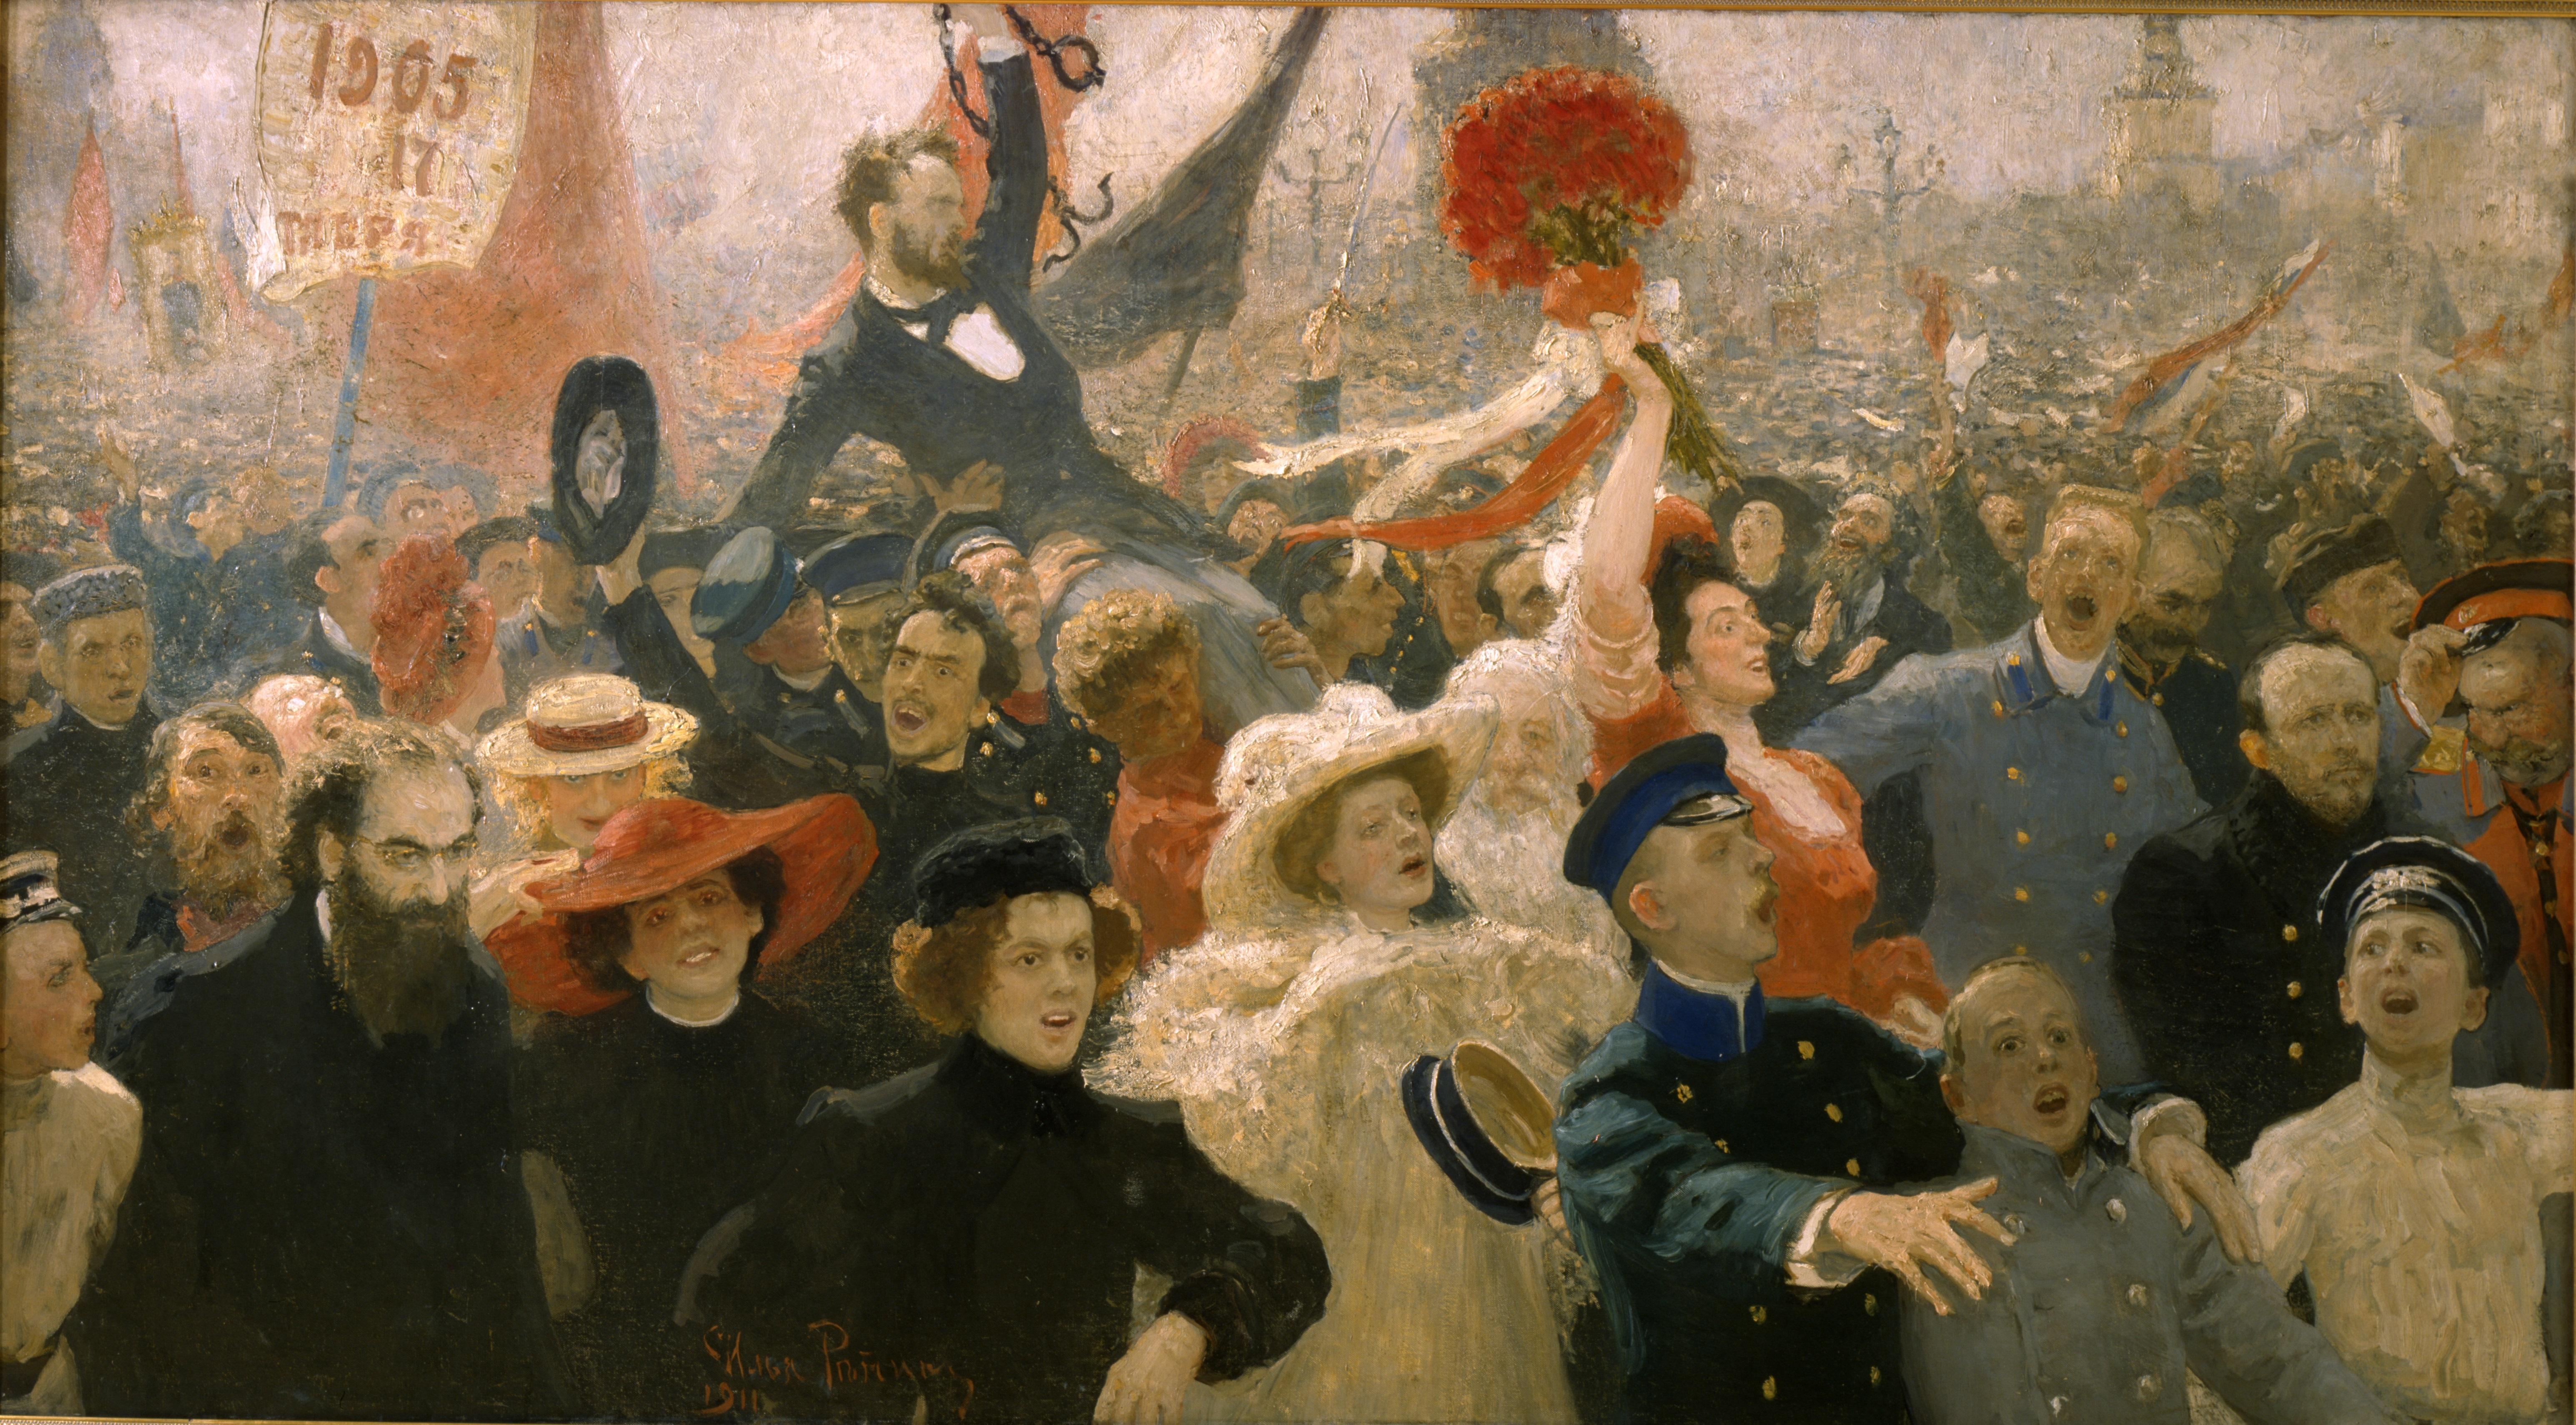 Il'ja Repin, 17 ottobre 1905, olio su tela, 1910 © State Russian Museum, St. Petersburg